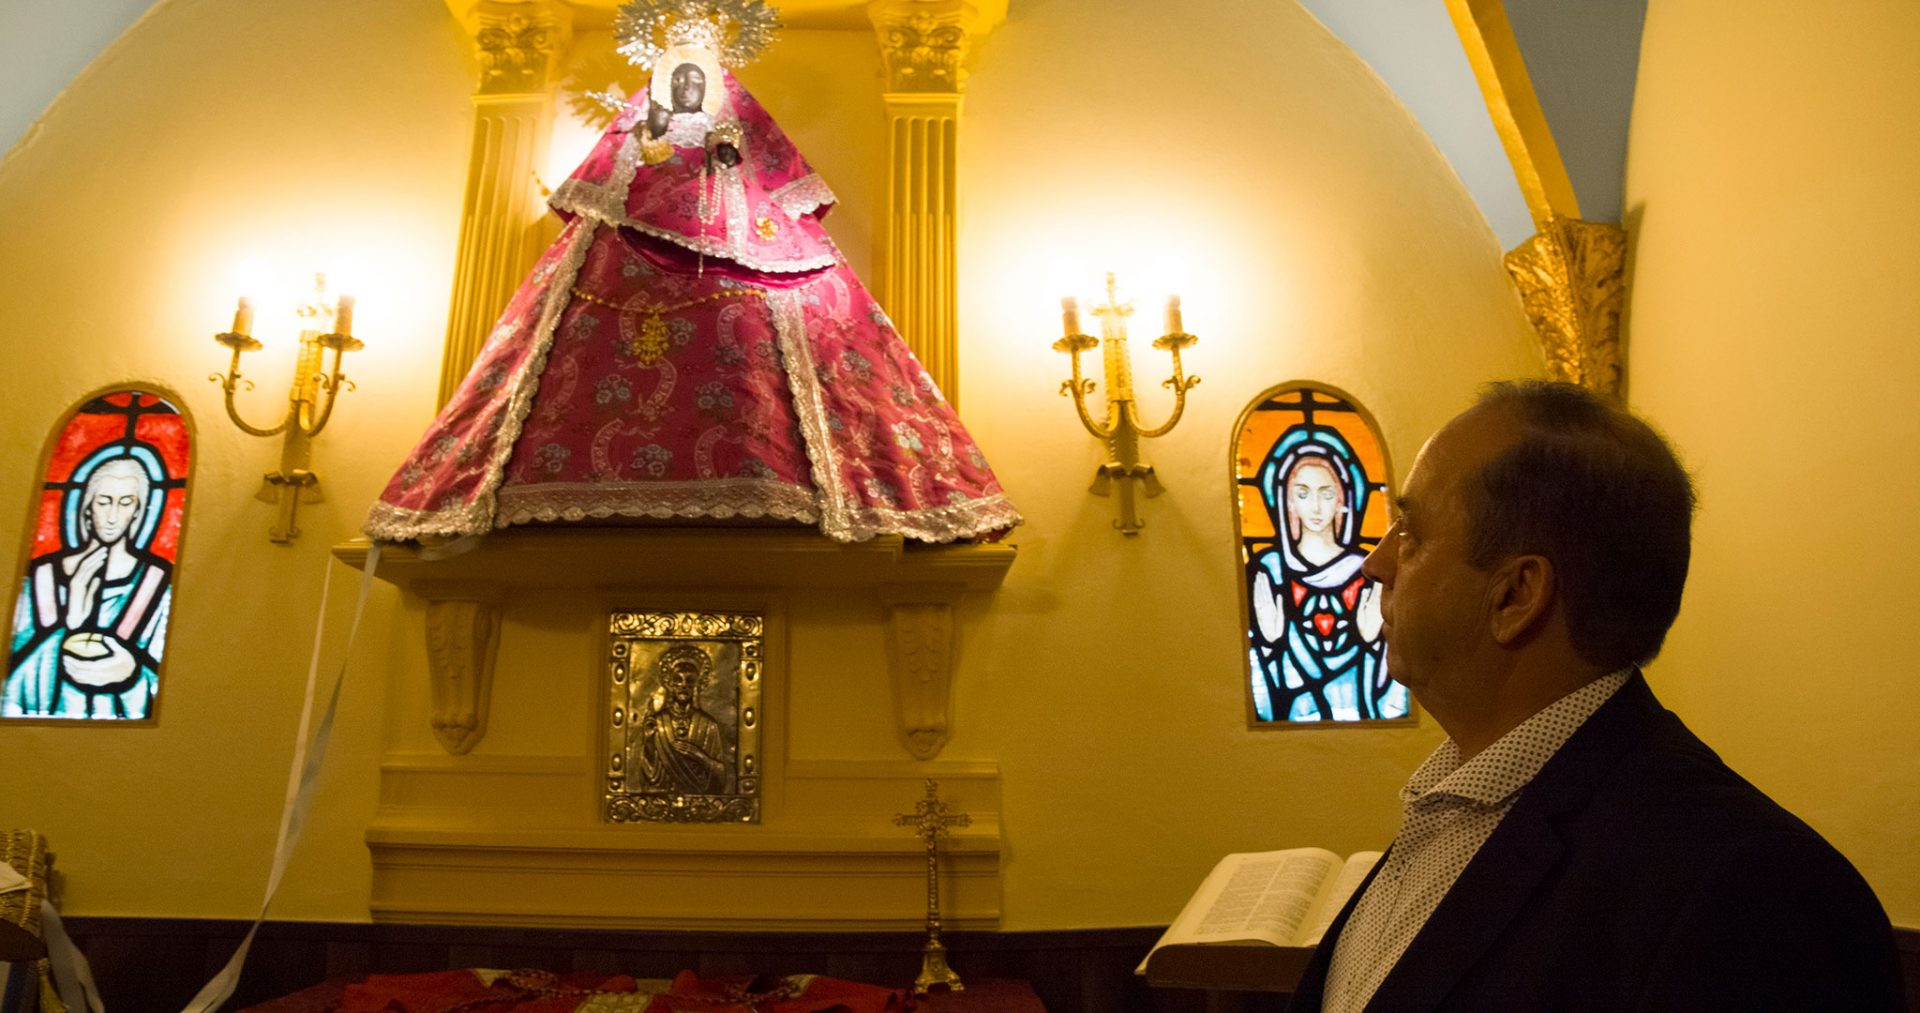 Réplica de la Virgen de Guadalupe en Carrascalejo